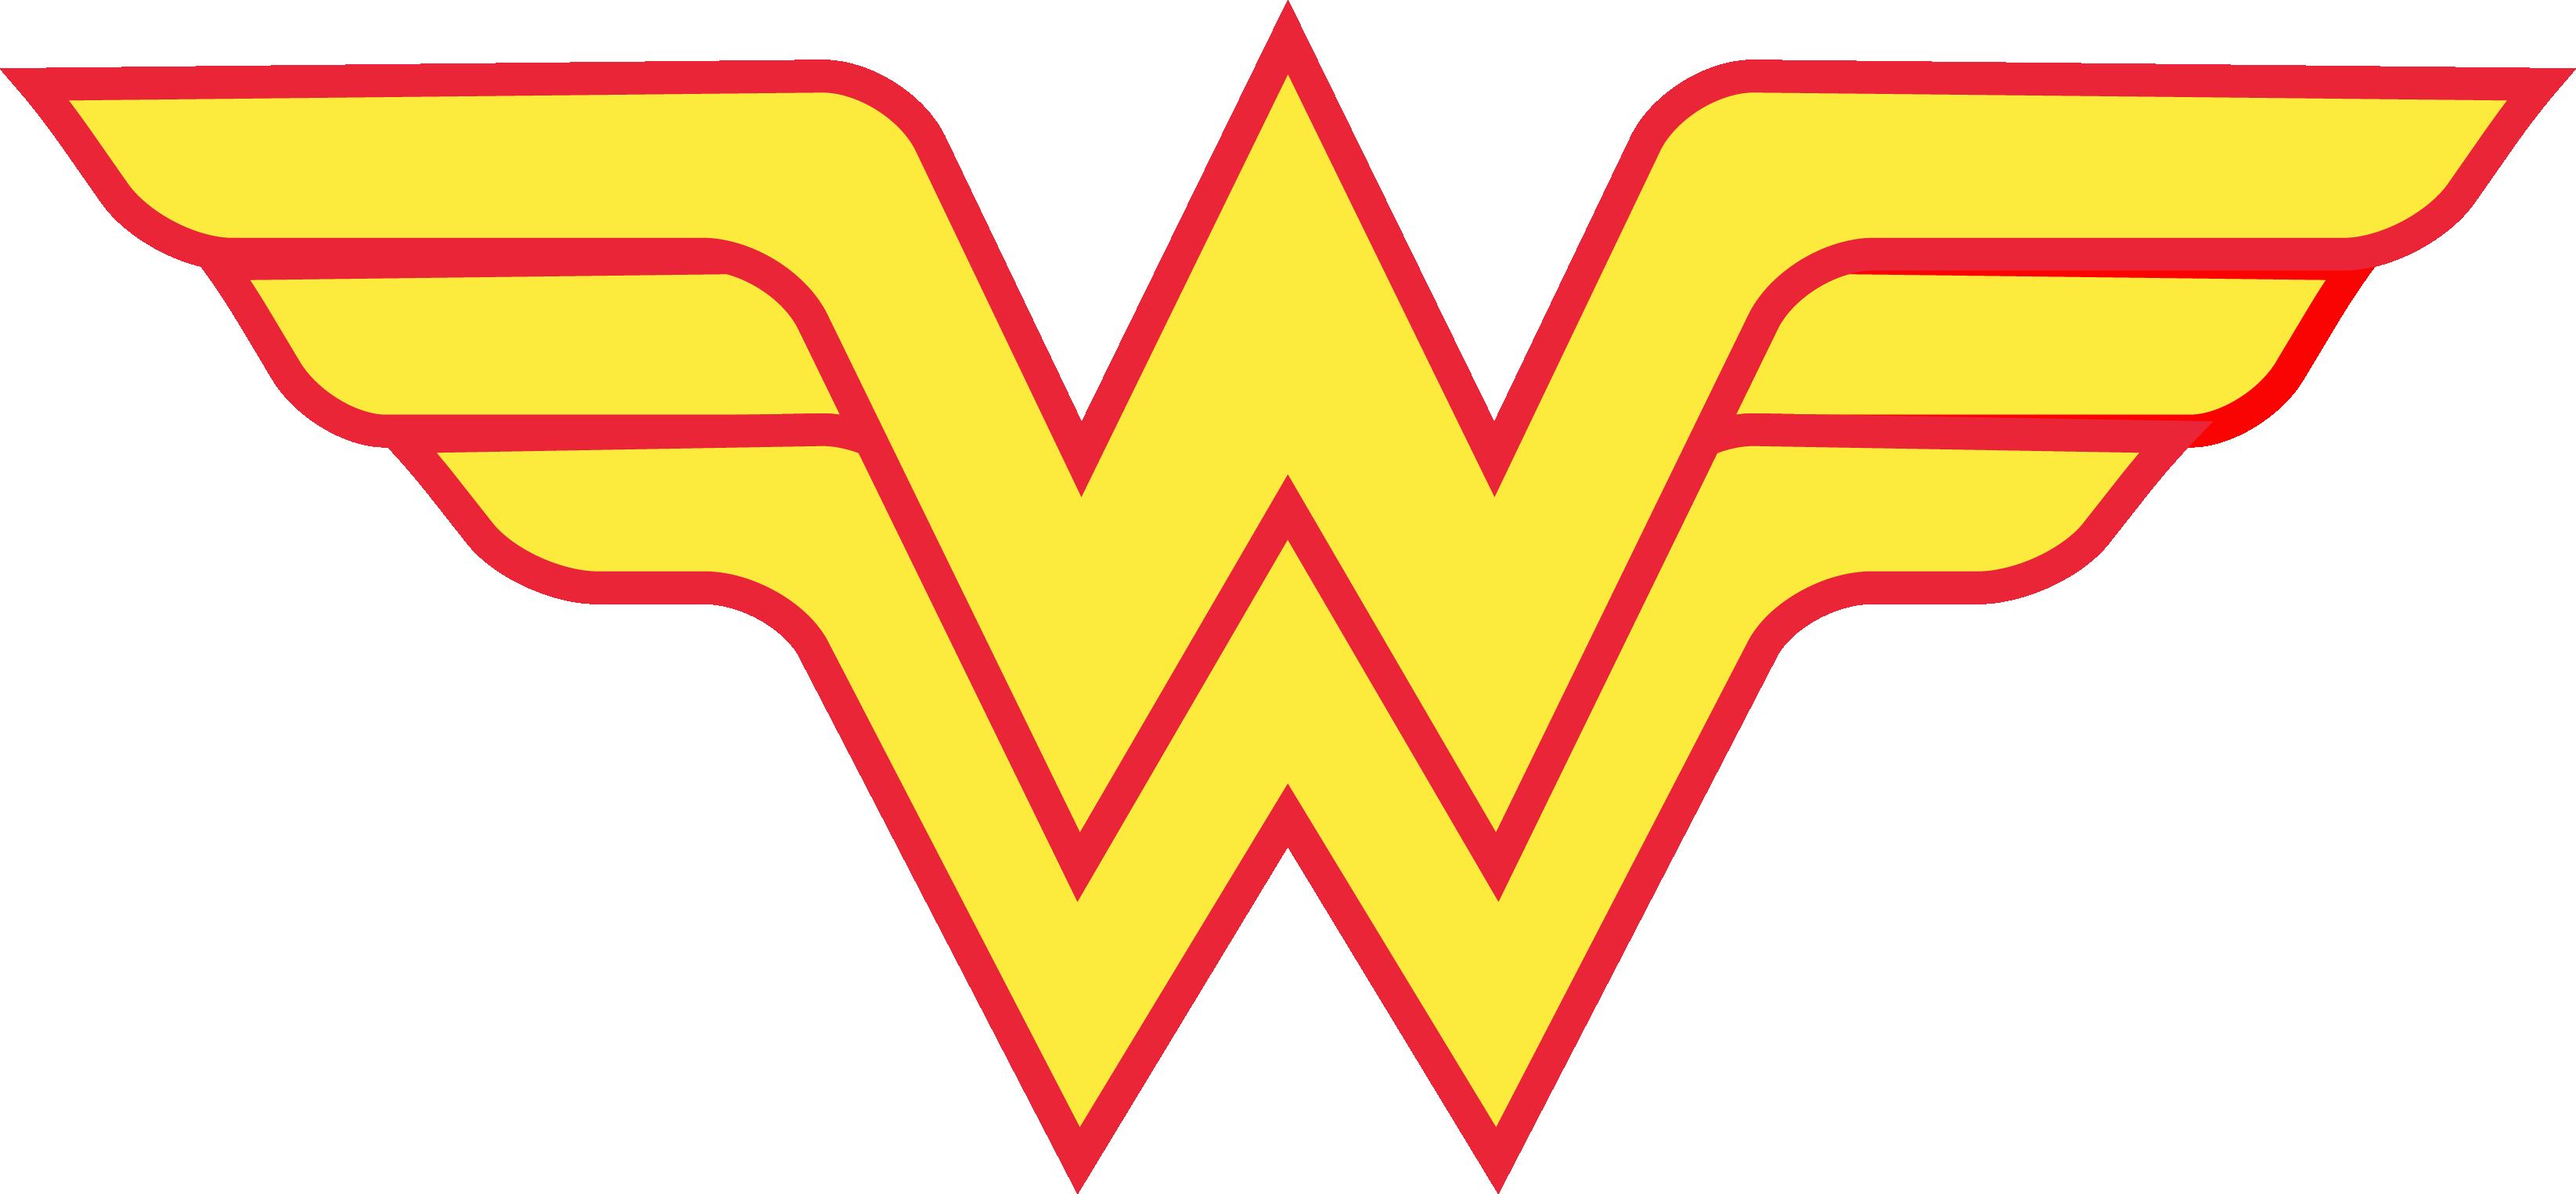 2034 Wonder Woman free clipart.